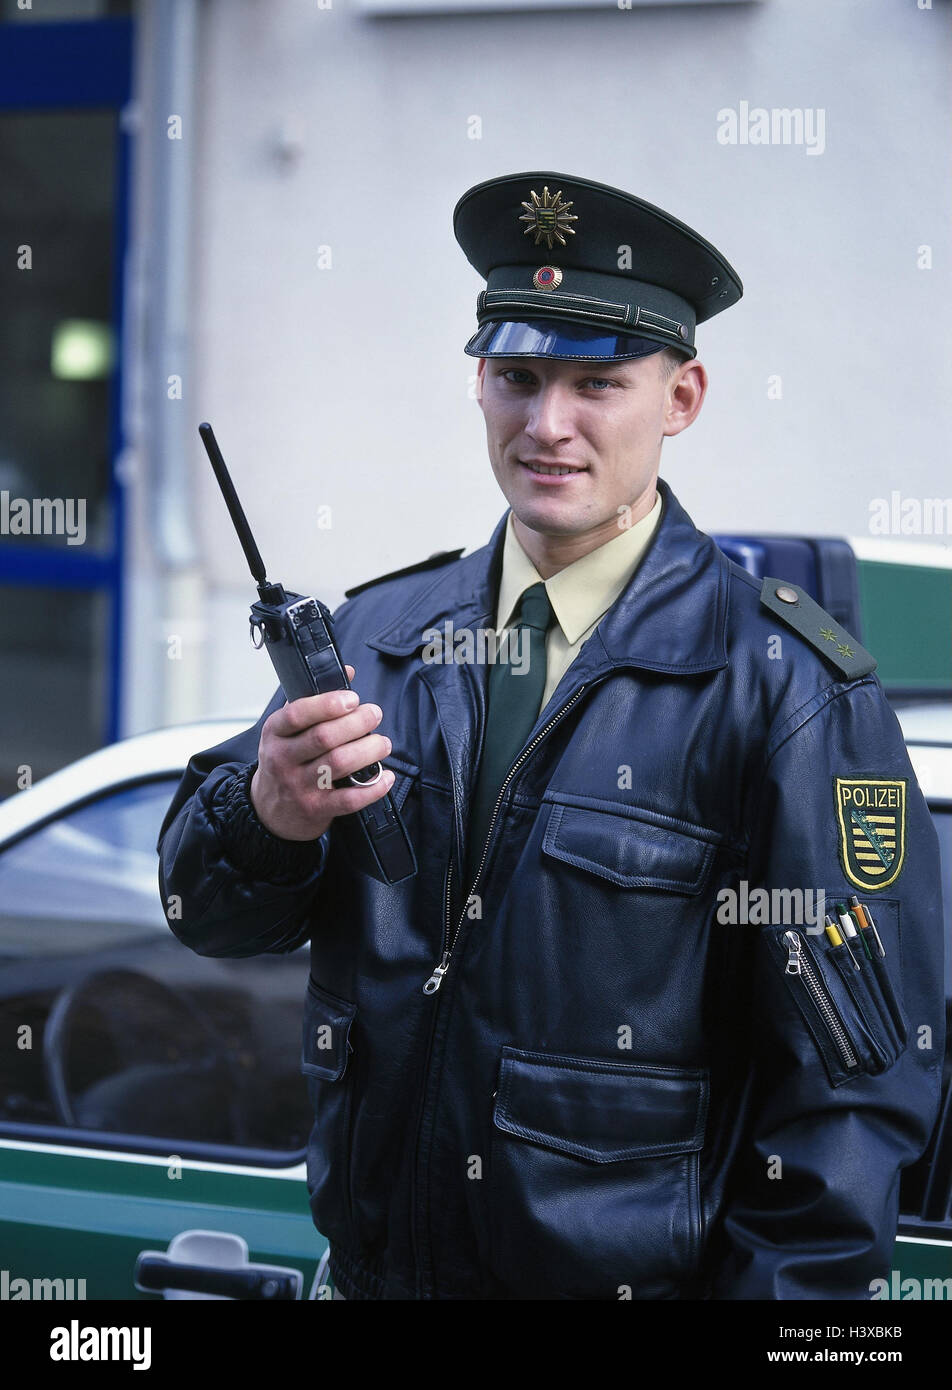 Policeman, transceiver, half portrait, occupation, work, work, police, man, uniform, police uniform, police officer, - Stock Image